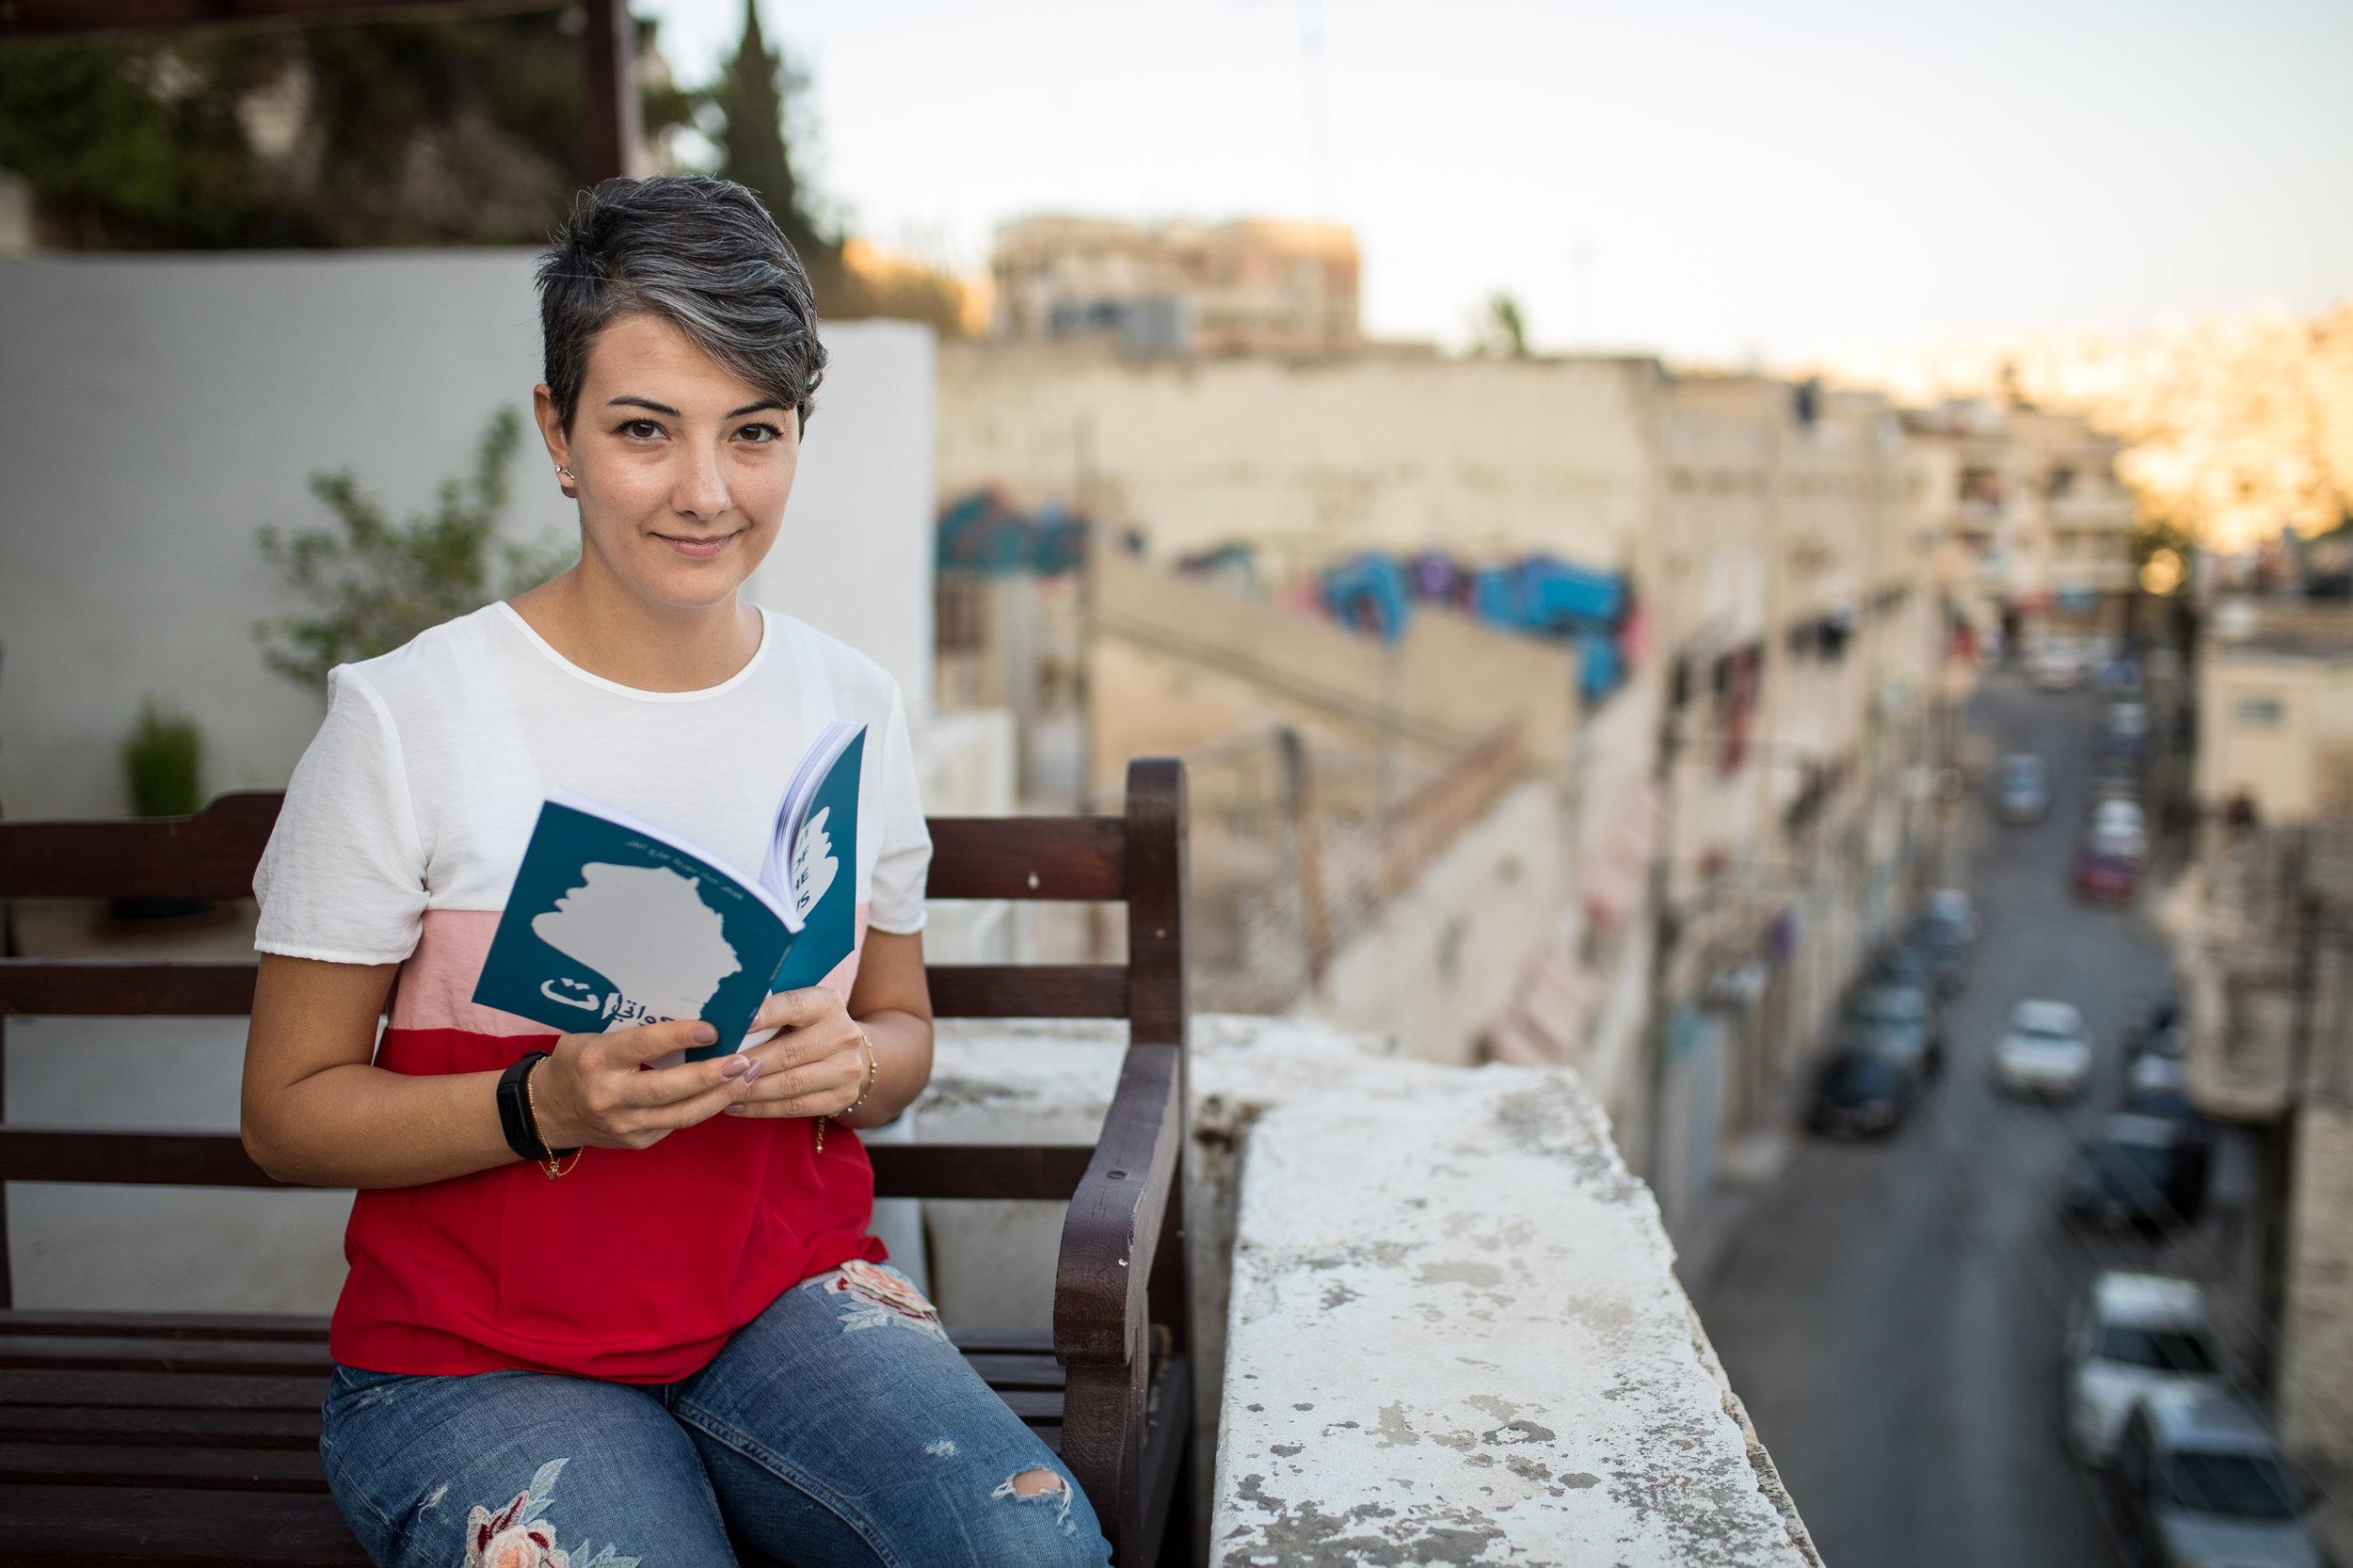 2018-06-25_Milia Eidmouni (Syrian), Founder of SFJN, Amman, JO_0561.jpg